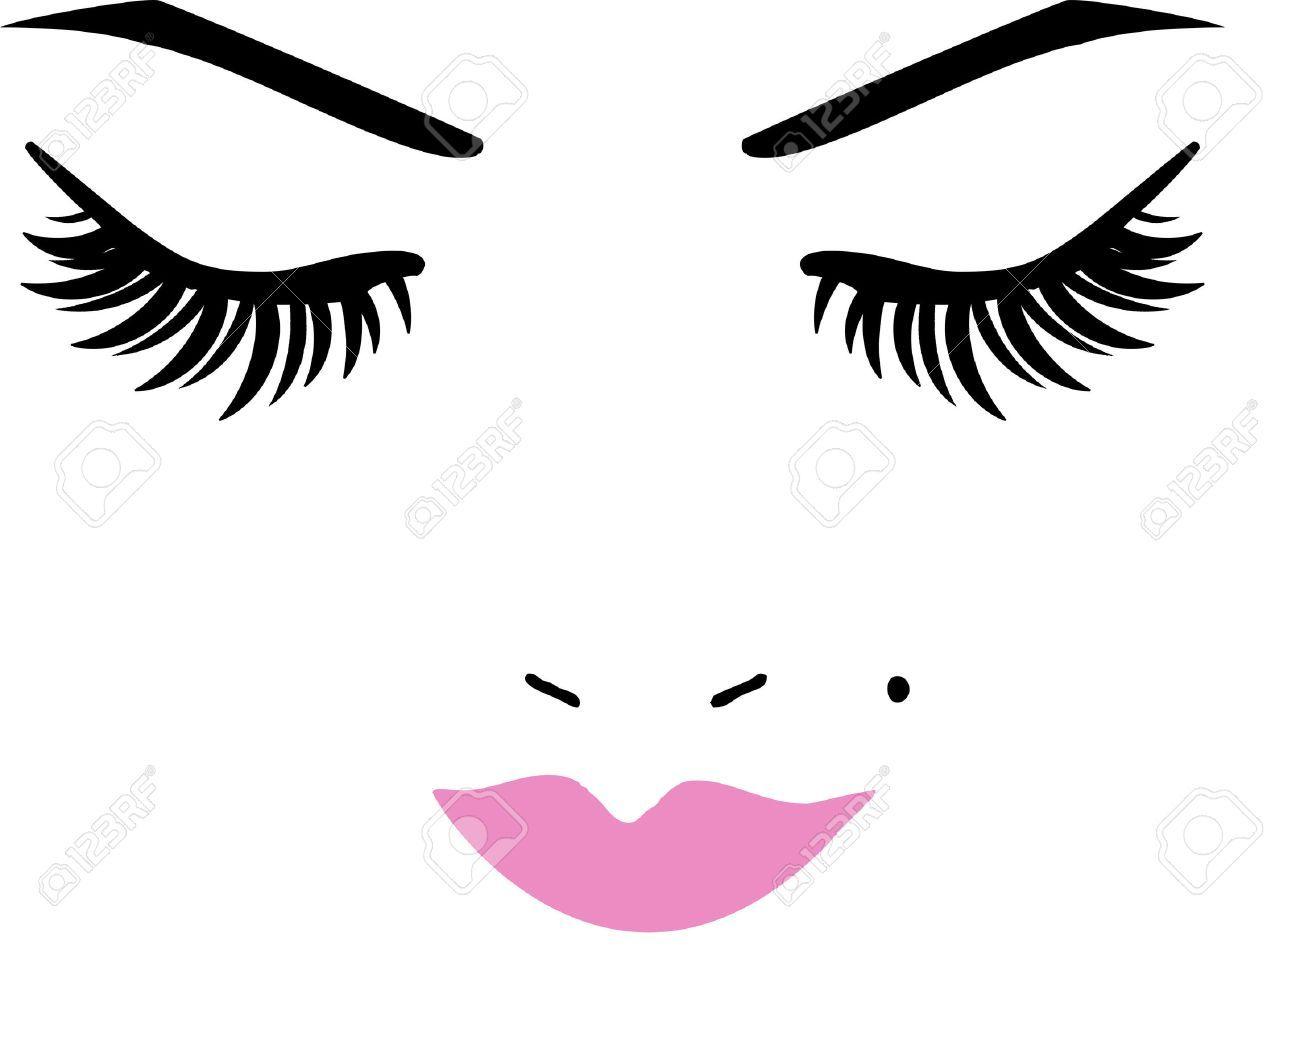 lashes cliparts stock. Eyelashes clipart makeup artist